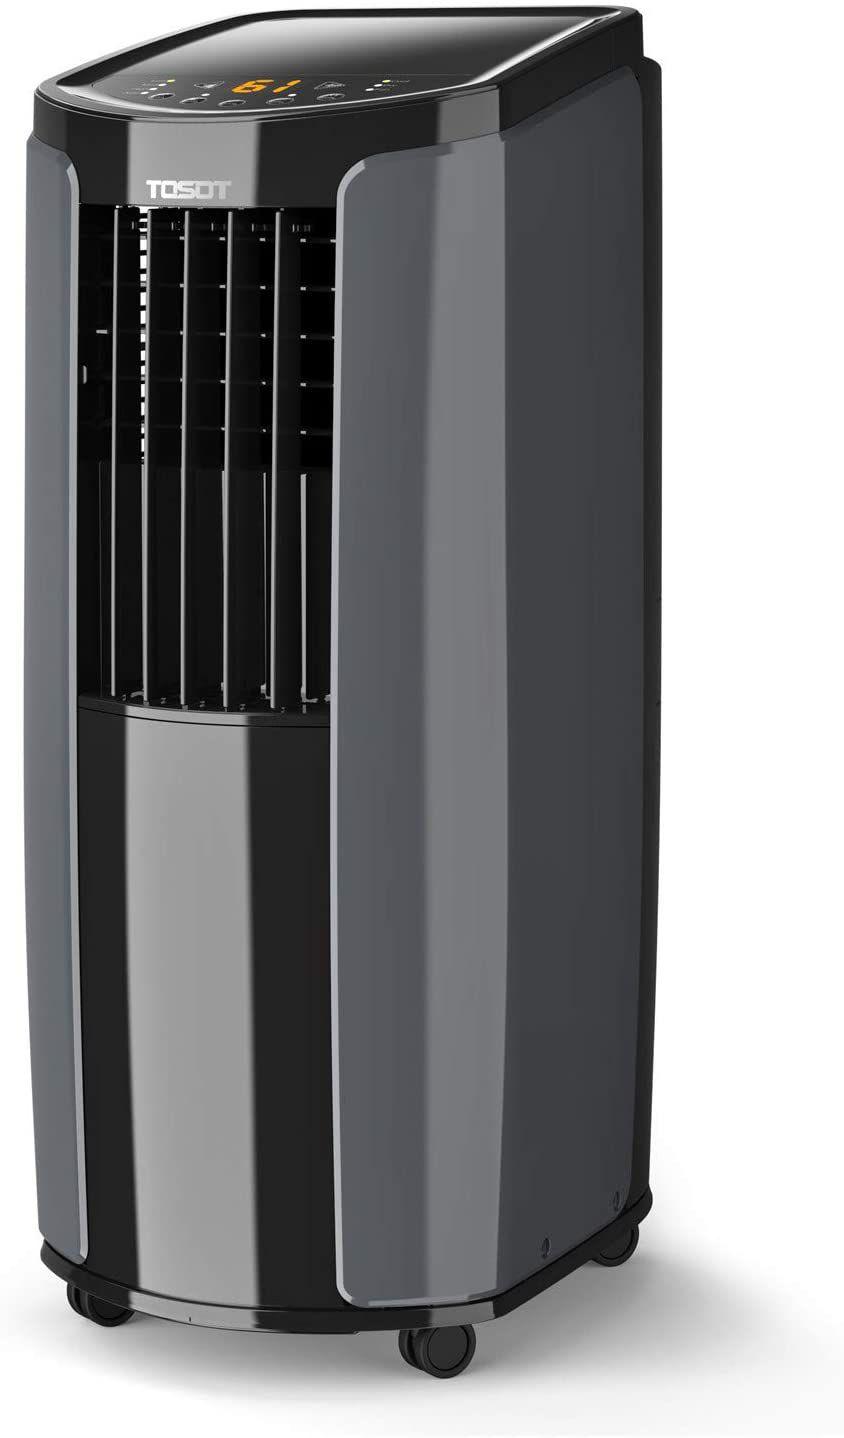 TOSOT 10,000 BTU Portable Air Conditioner